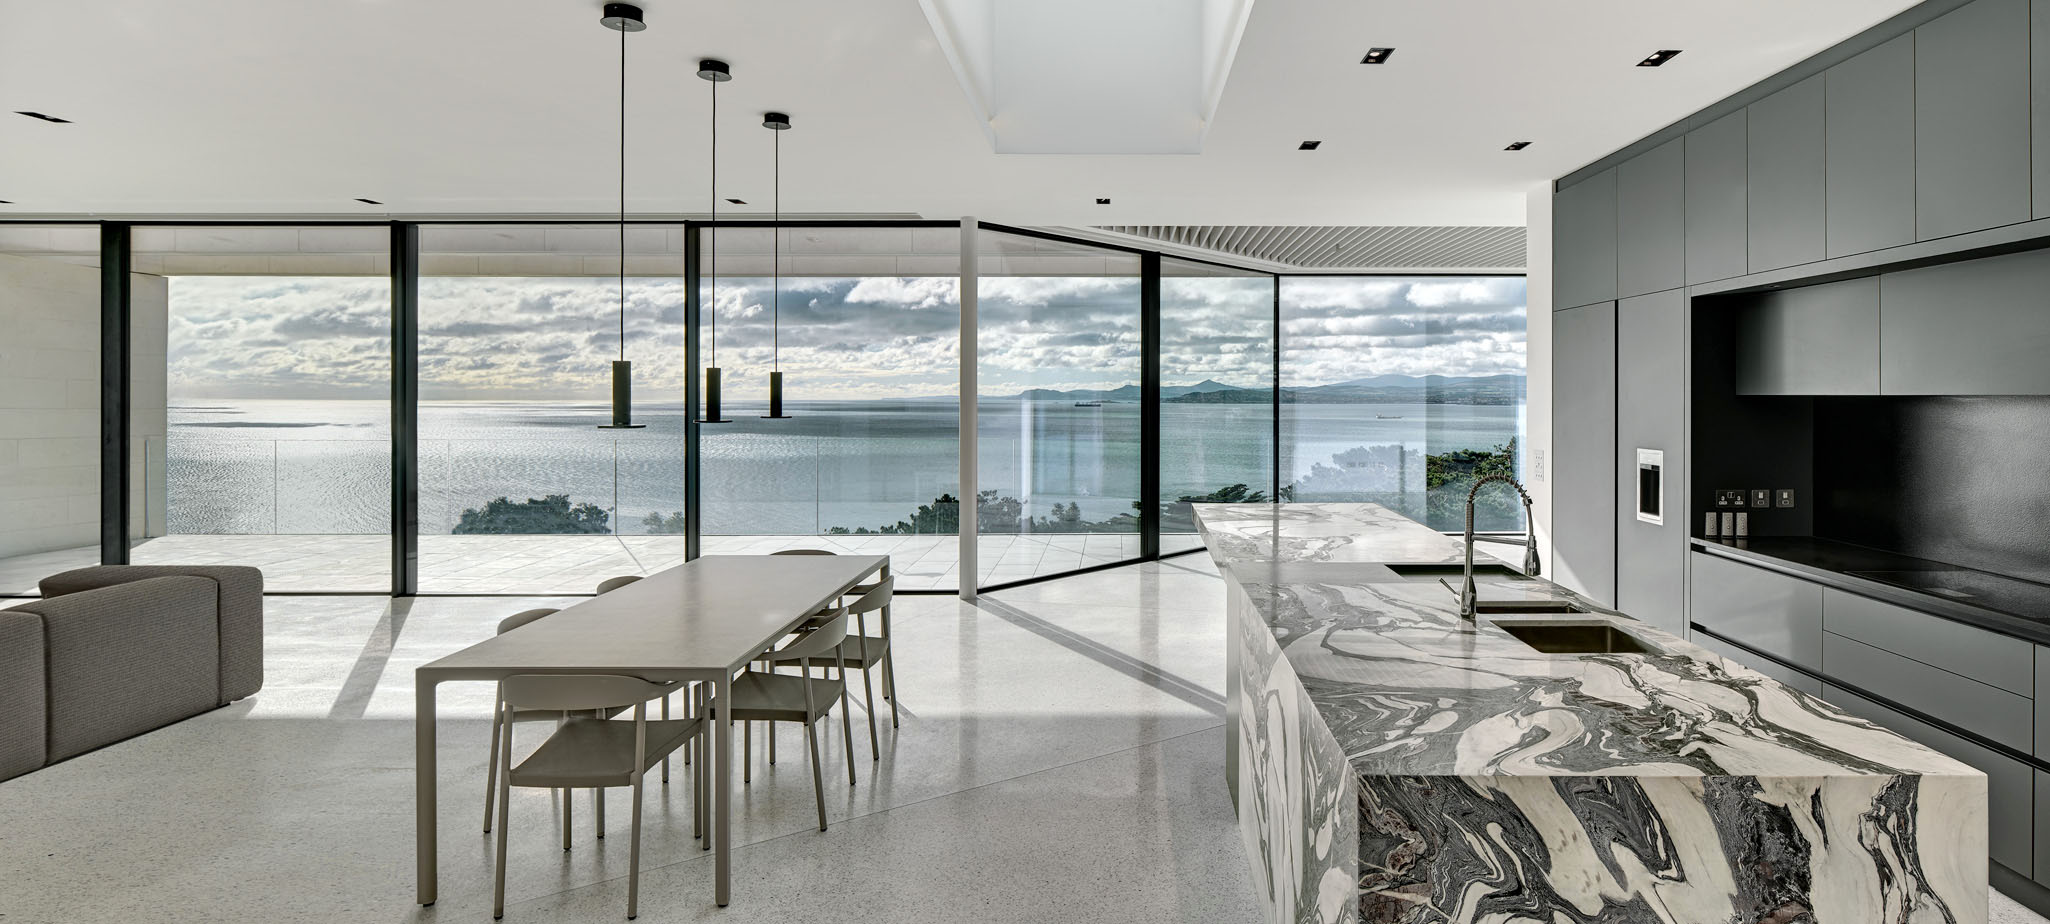 modern architecture photographer PAC Studio